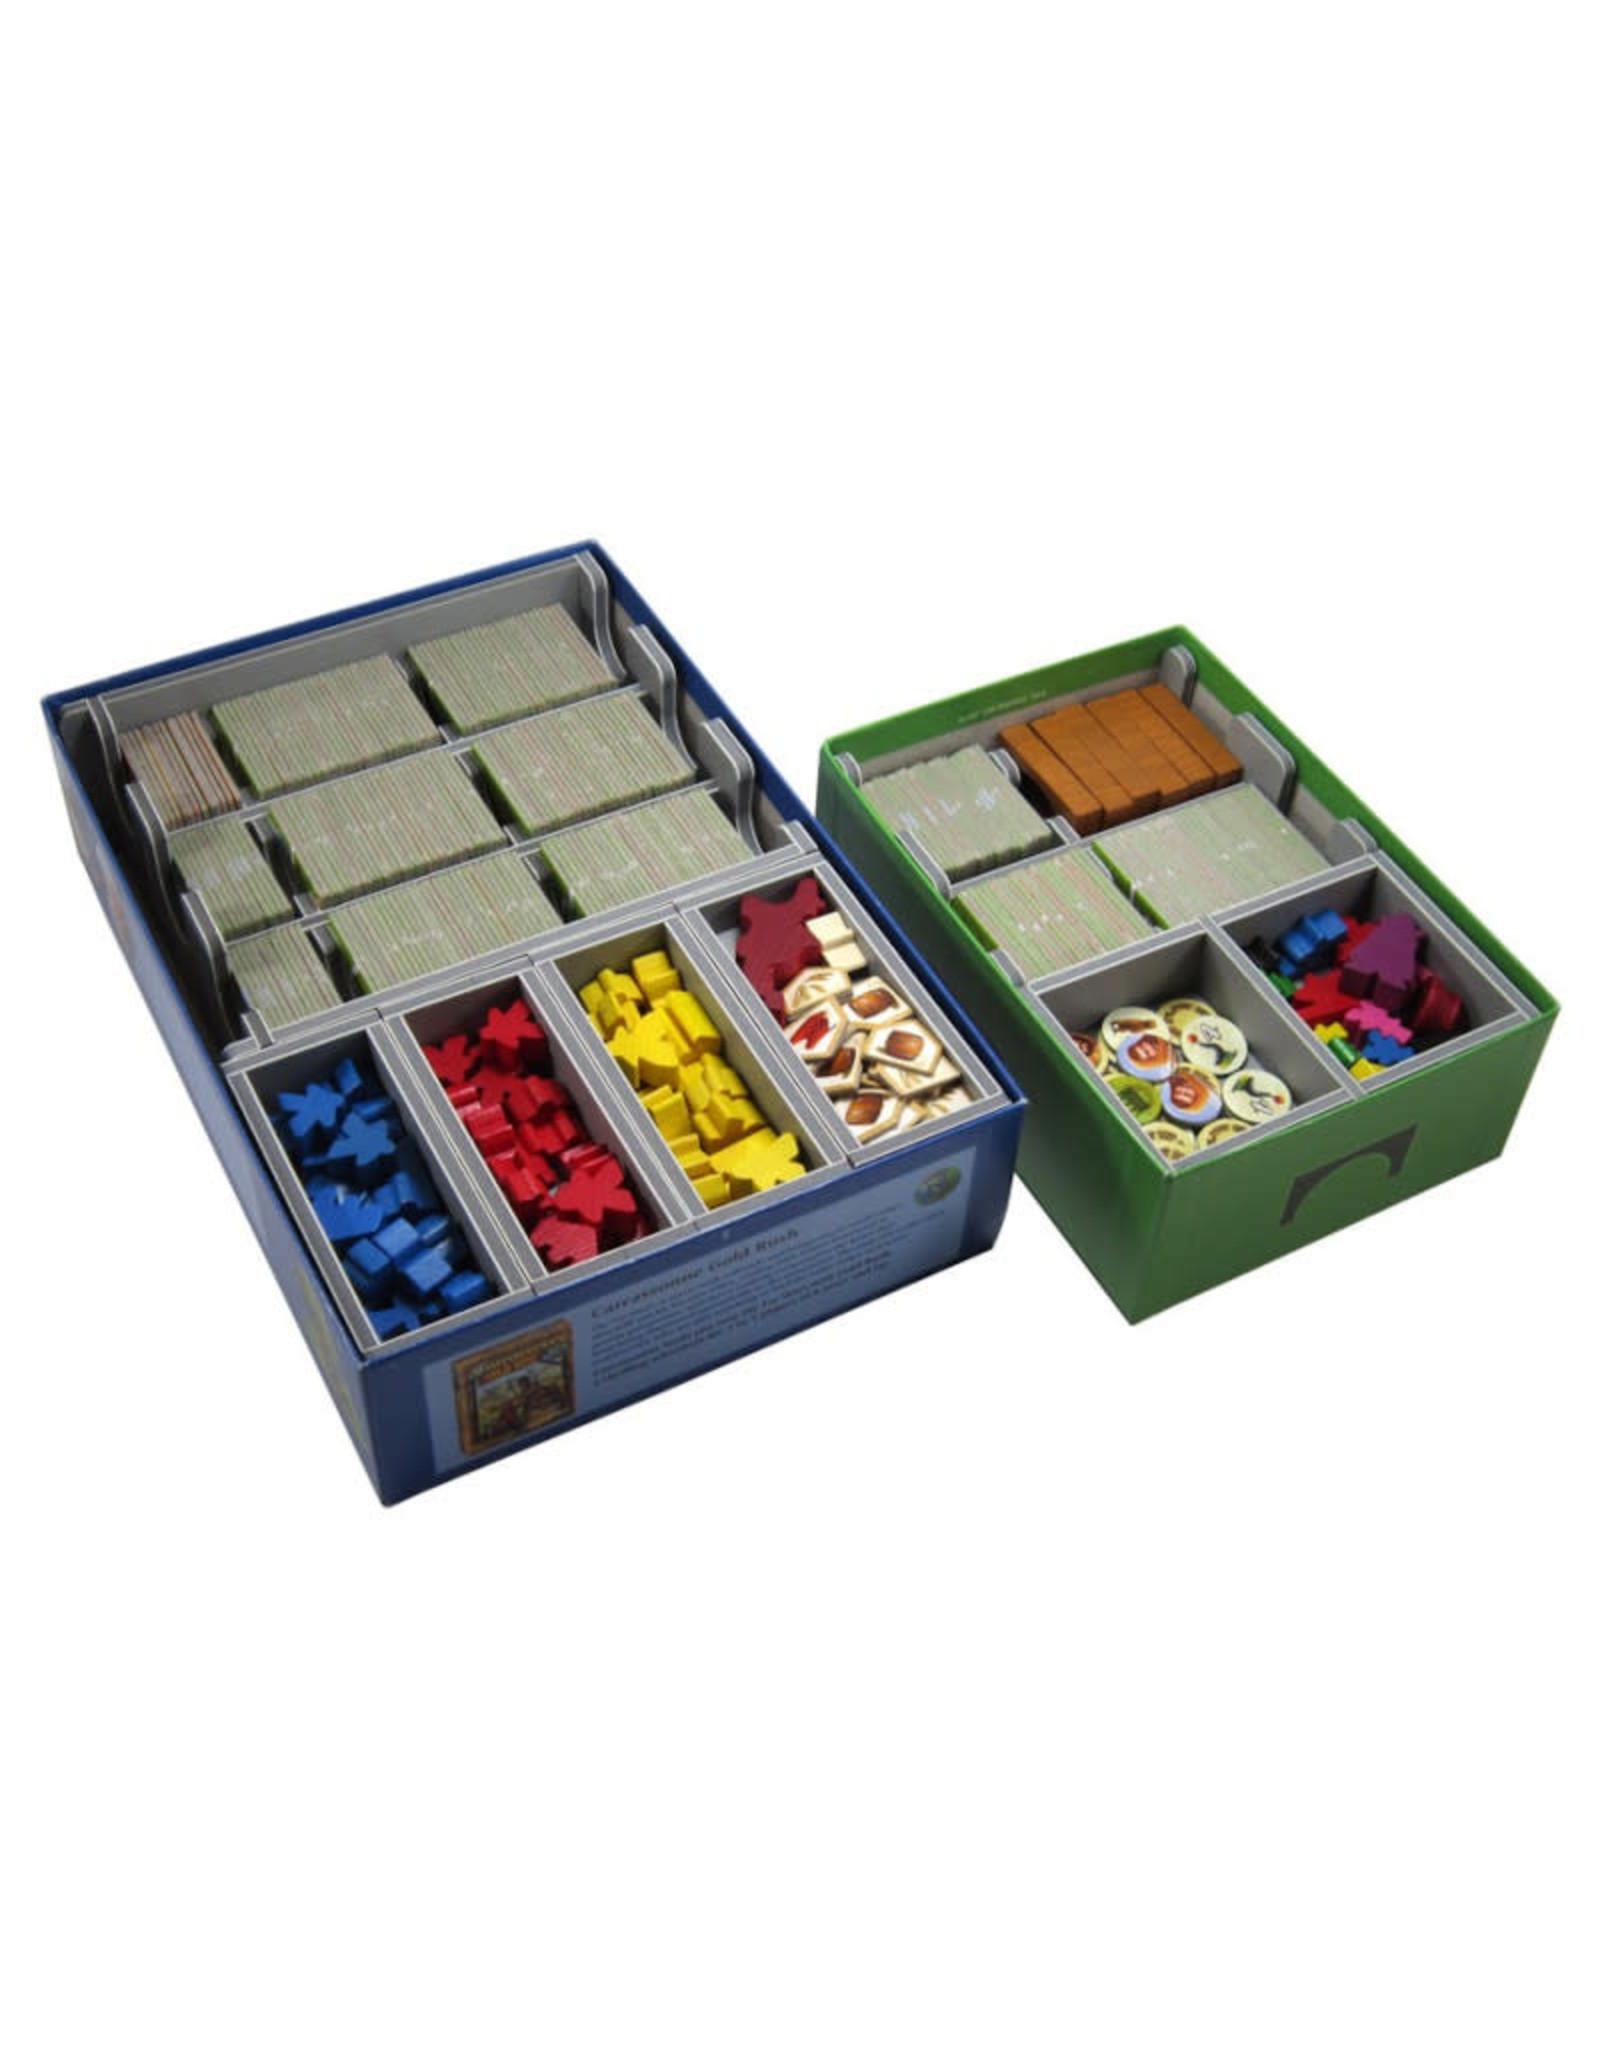 Folded Space Box Insert: Carcassonne